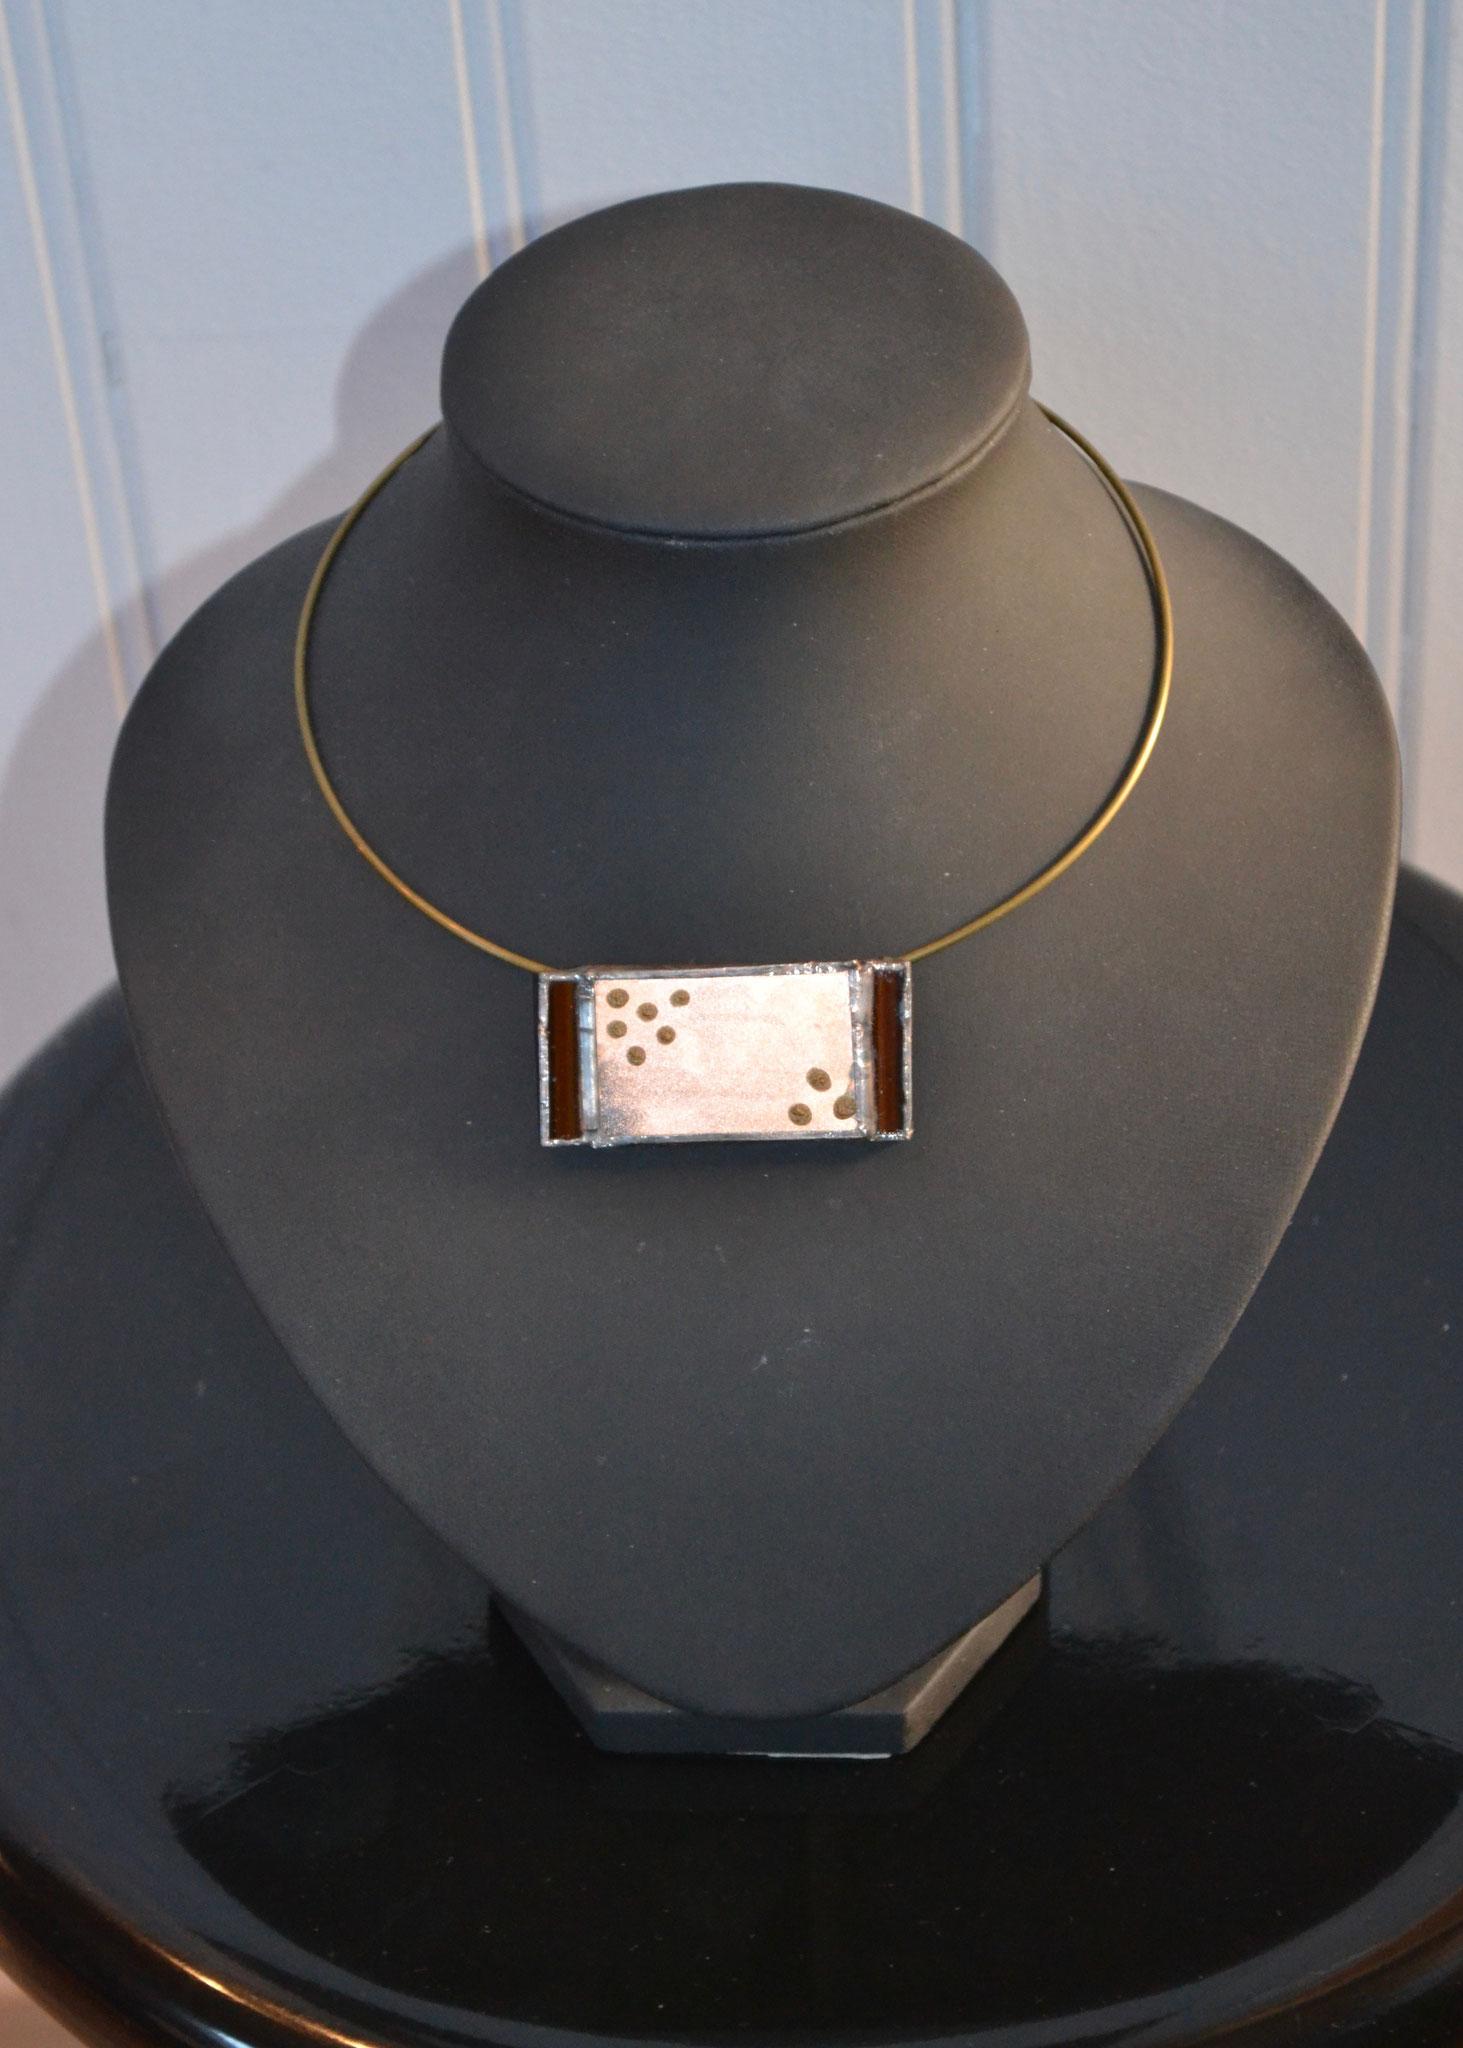 Pendentif Tiffany poudre de cuivre entre 2 verres (5 x 2 cm) 19€     Ref: PE4